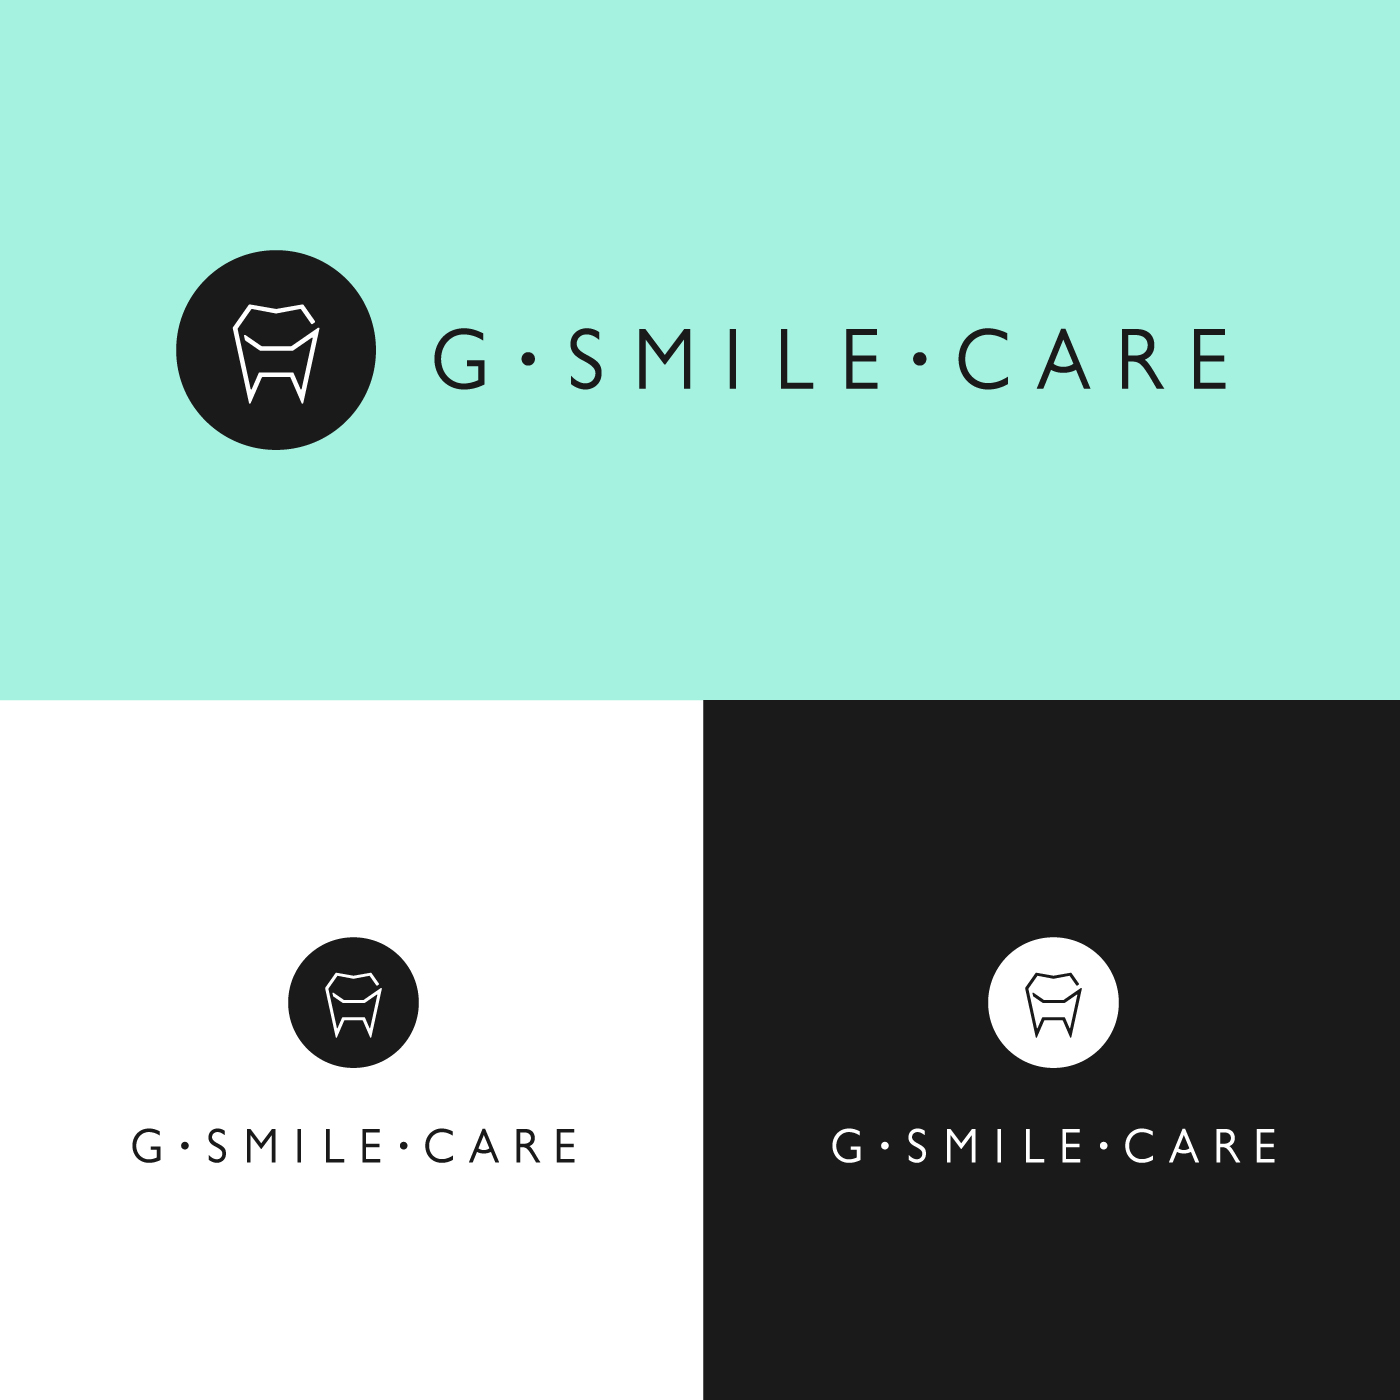 G Smile Care Logos